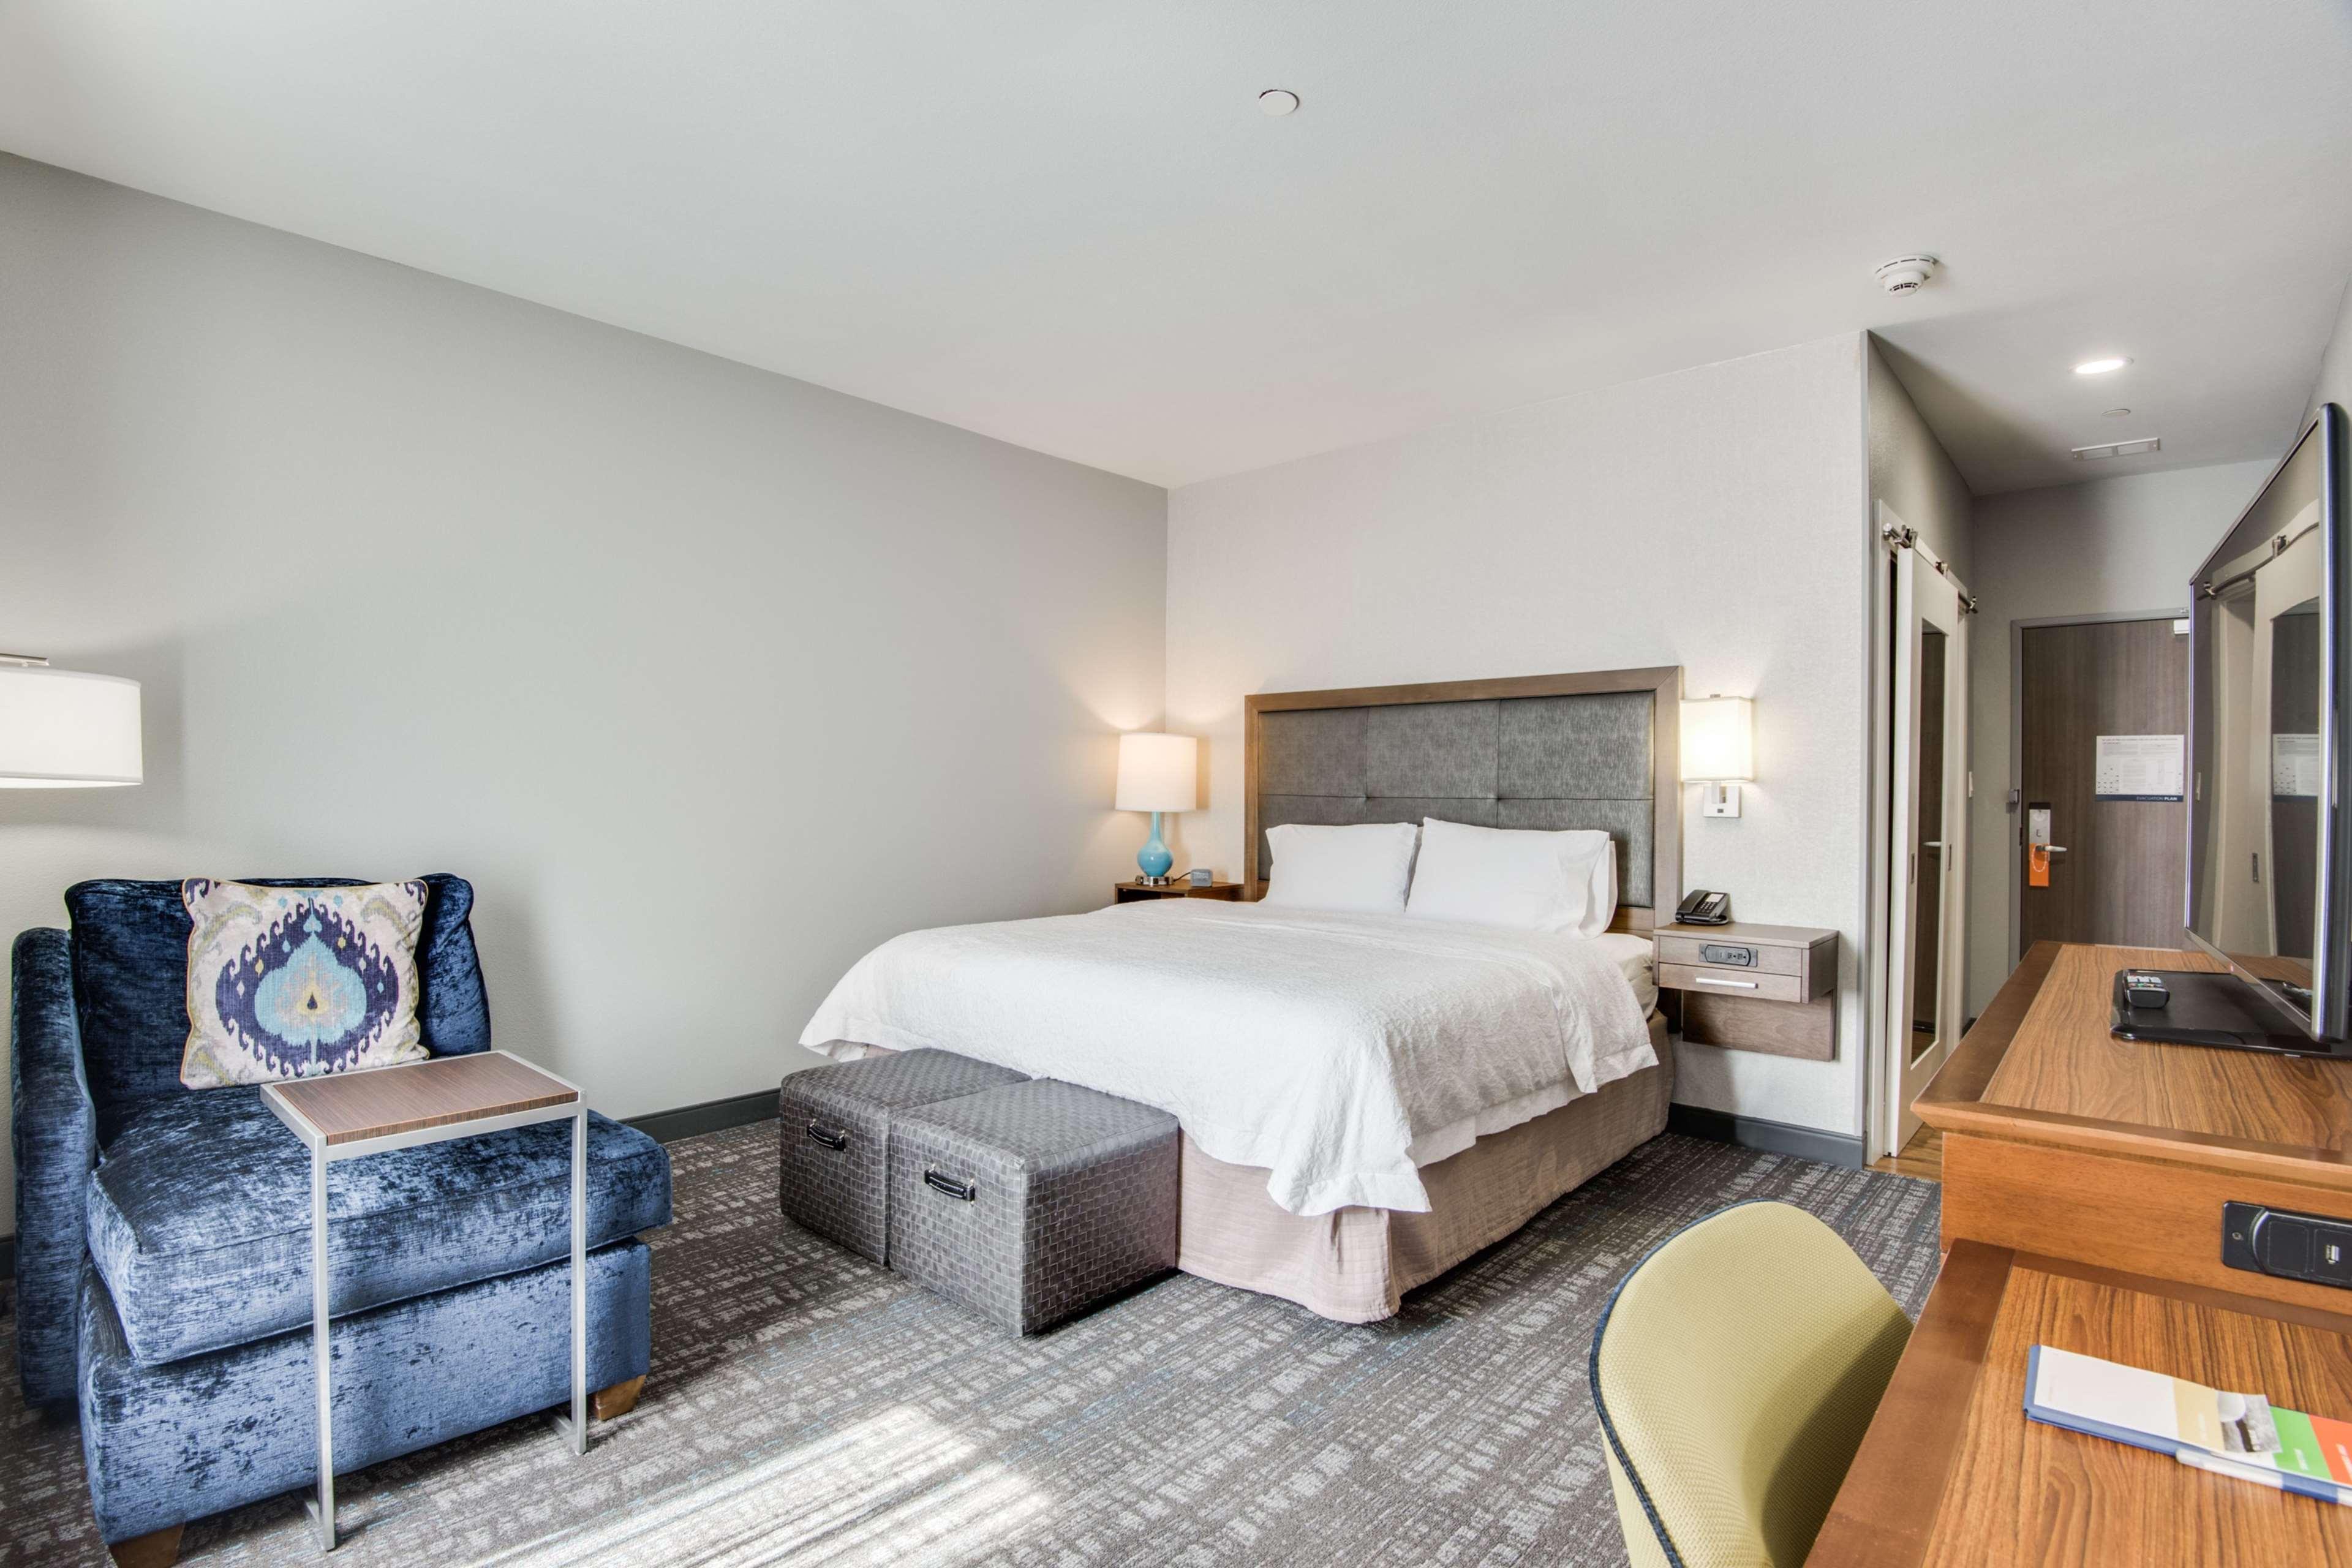 Hampton Inn & Suites Dallas/Ft. Worth Airport South image 15